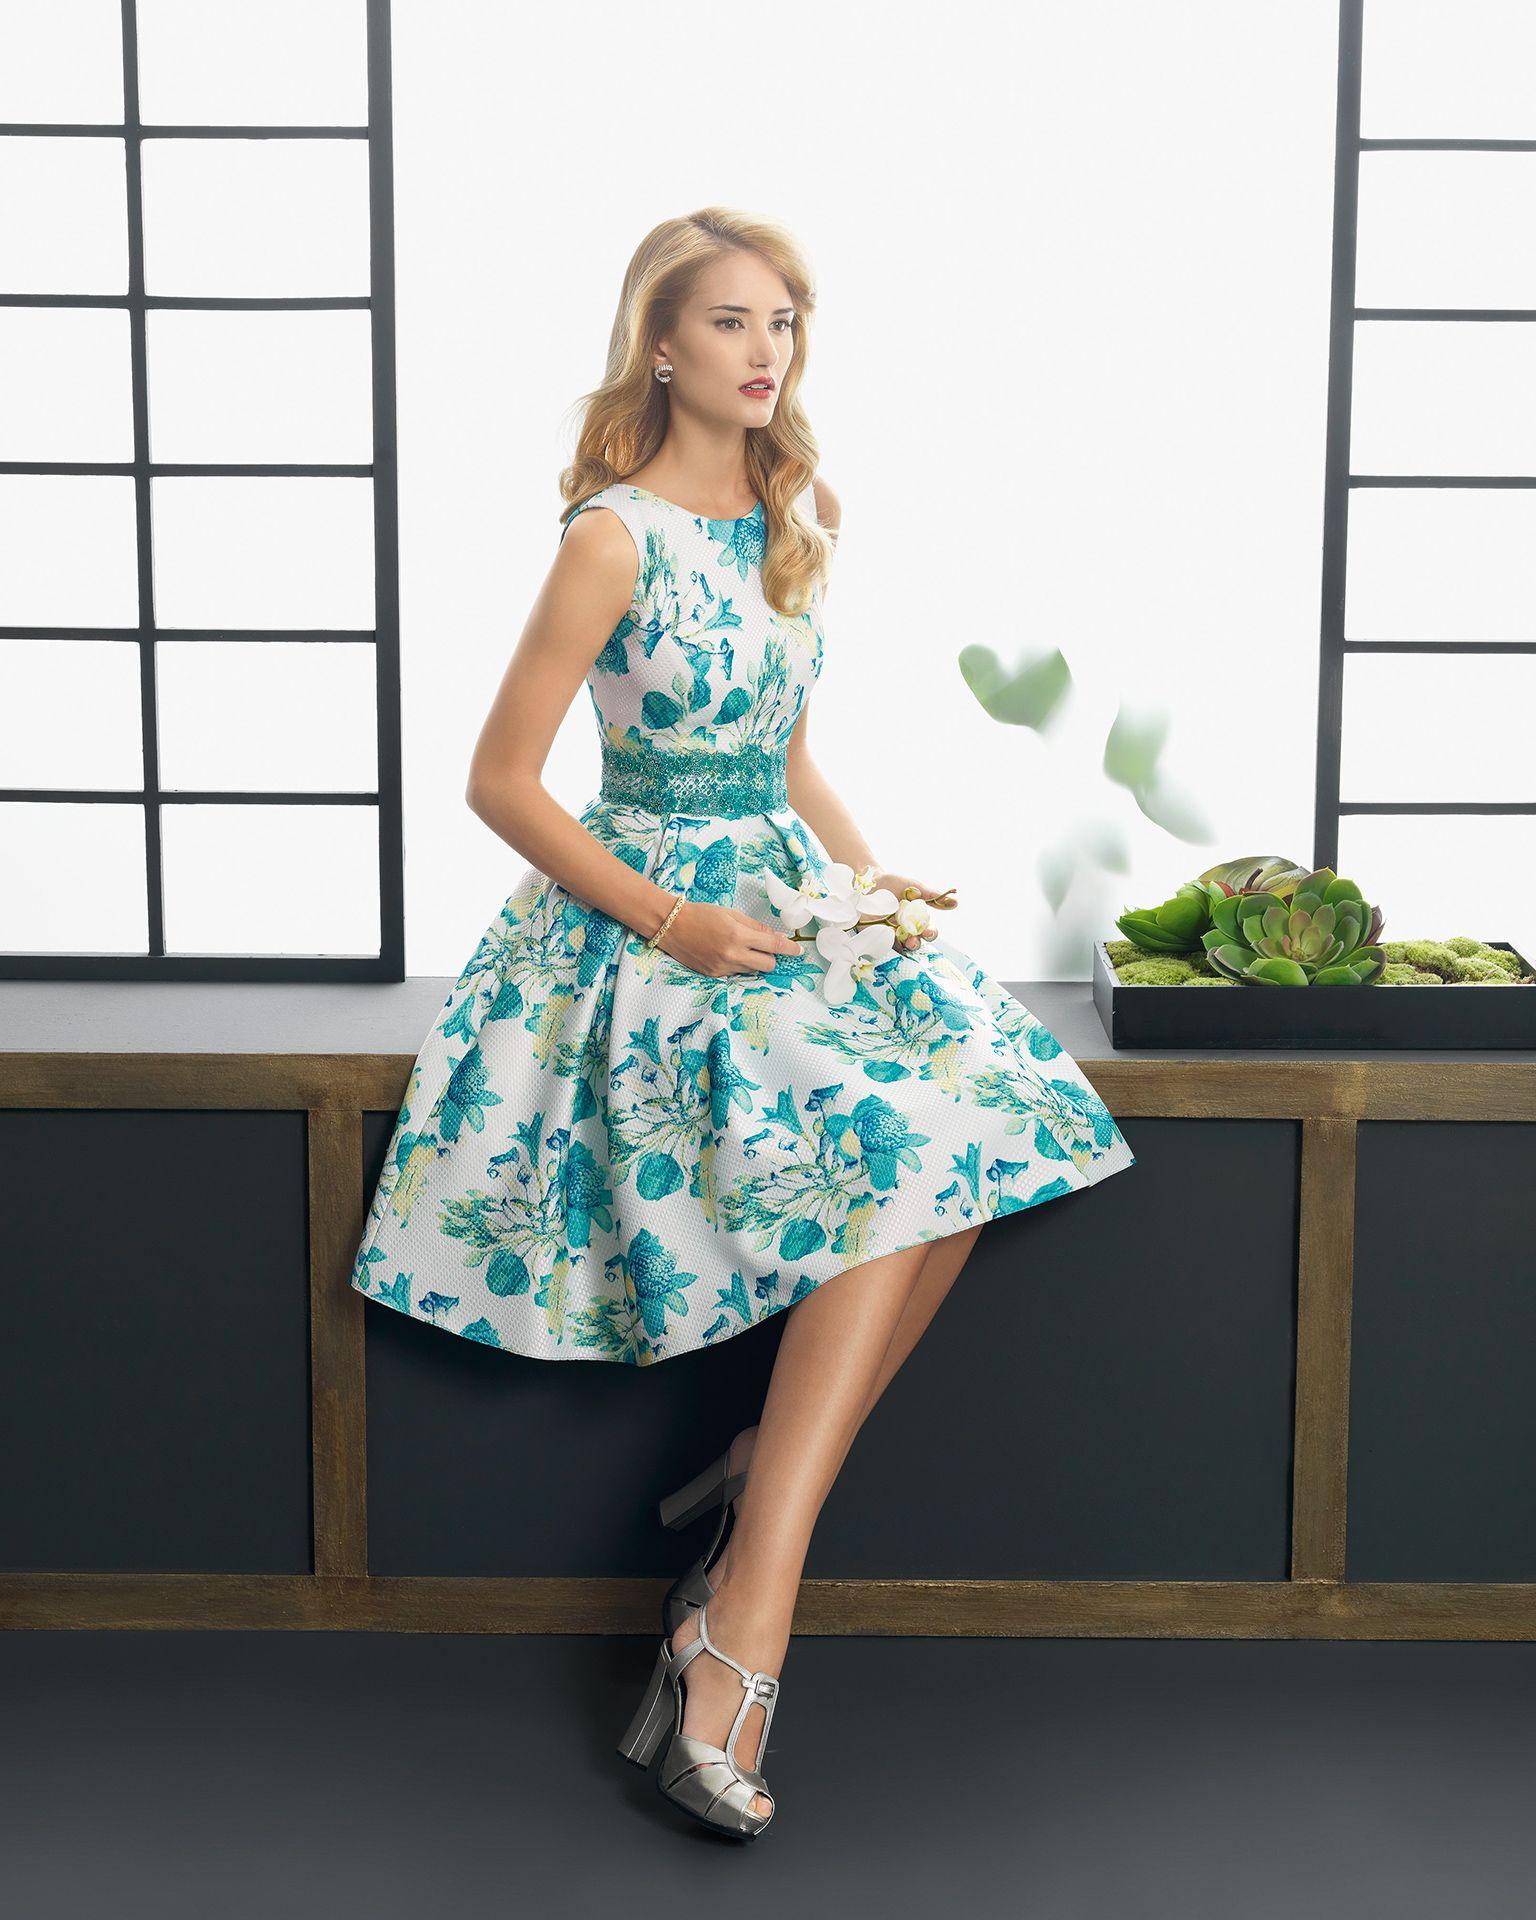 Vestidos estampados: Topos, rayas o flores | vestidos | Pinterest ...